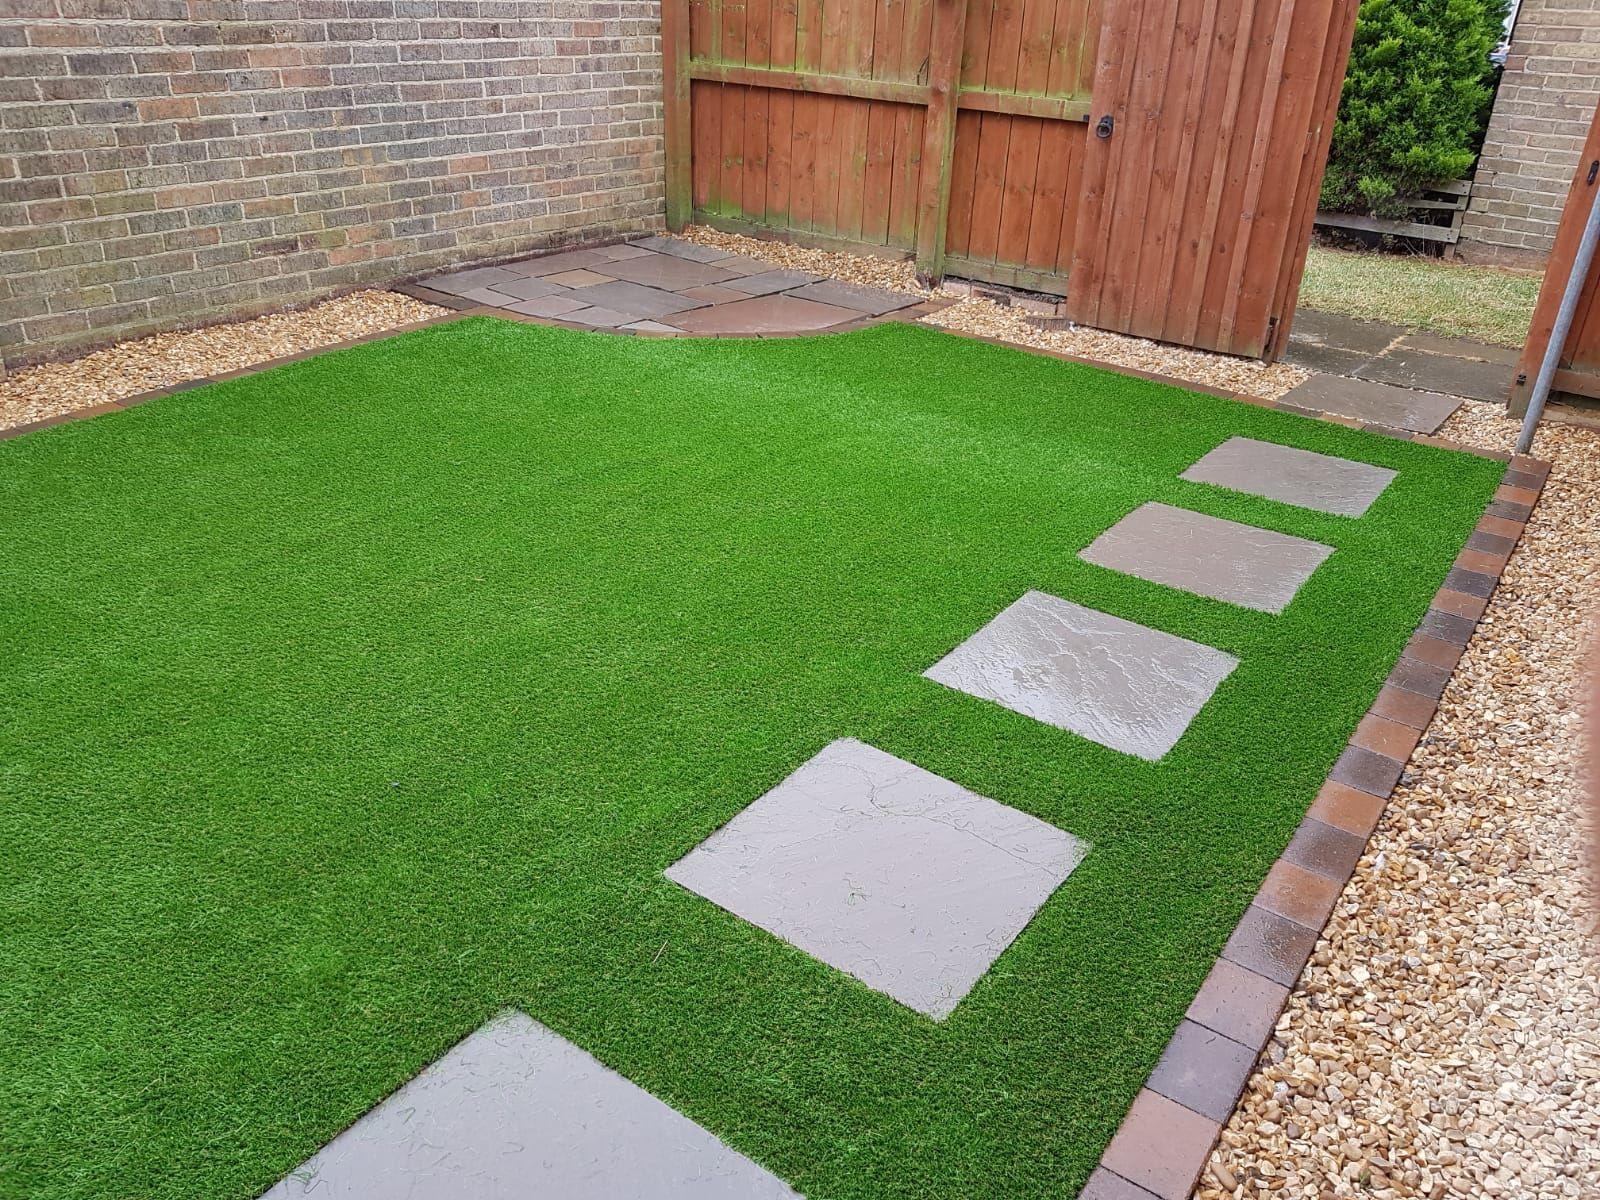 Staggering Backyard Ideas With Artificial Grass - yentua.com